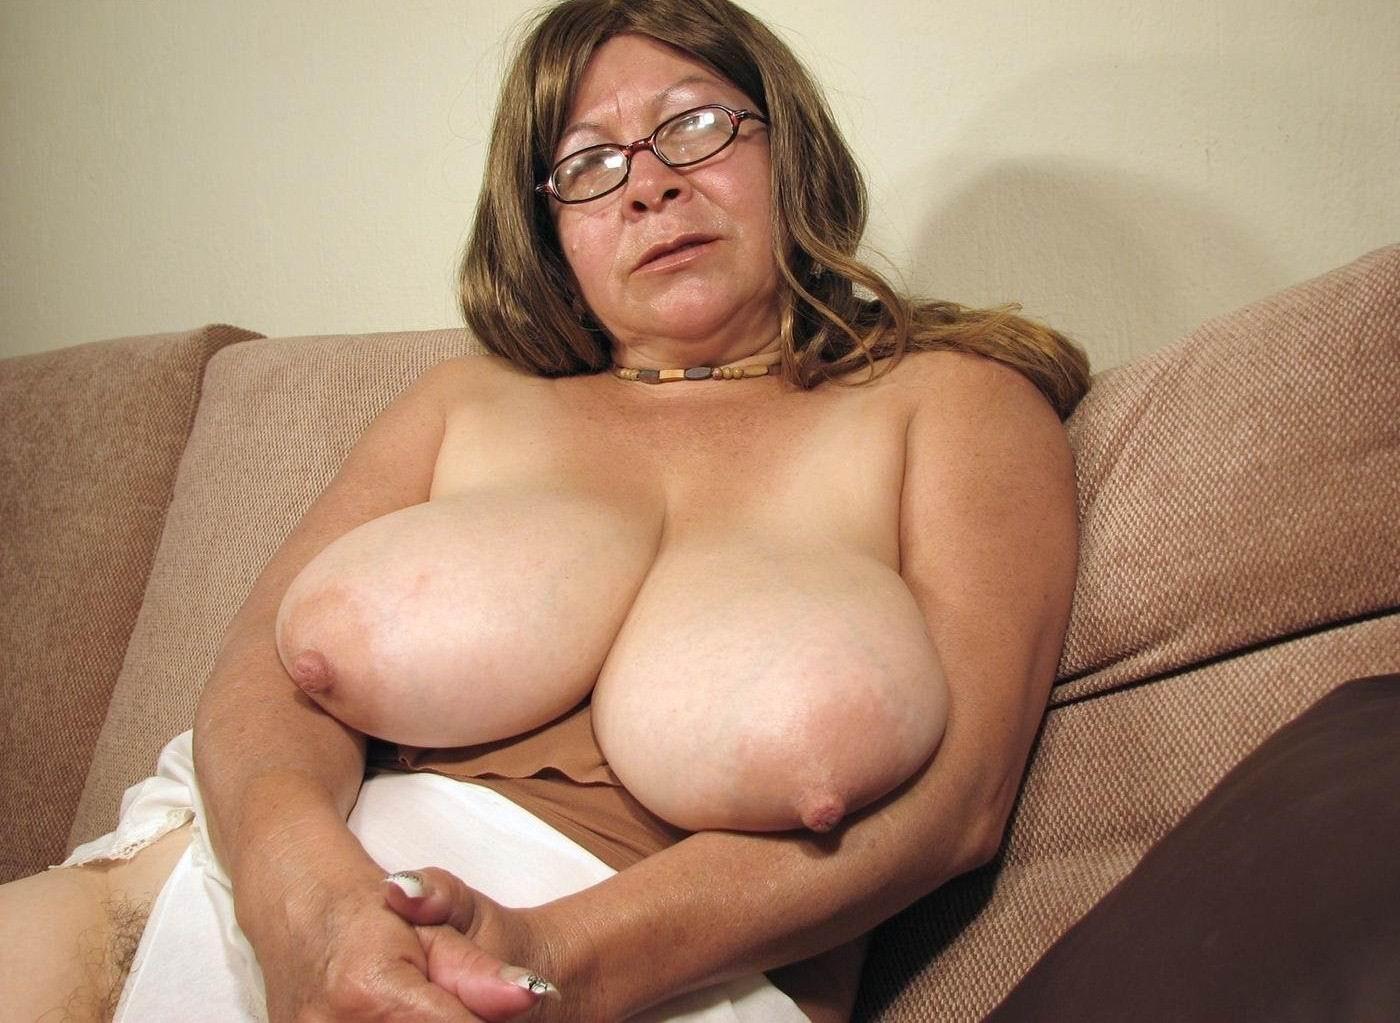 Free naked granny videos